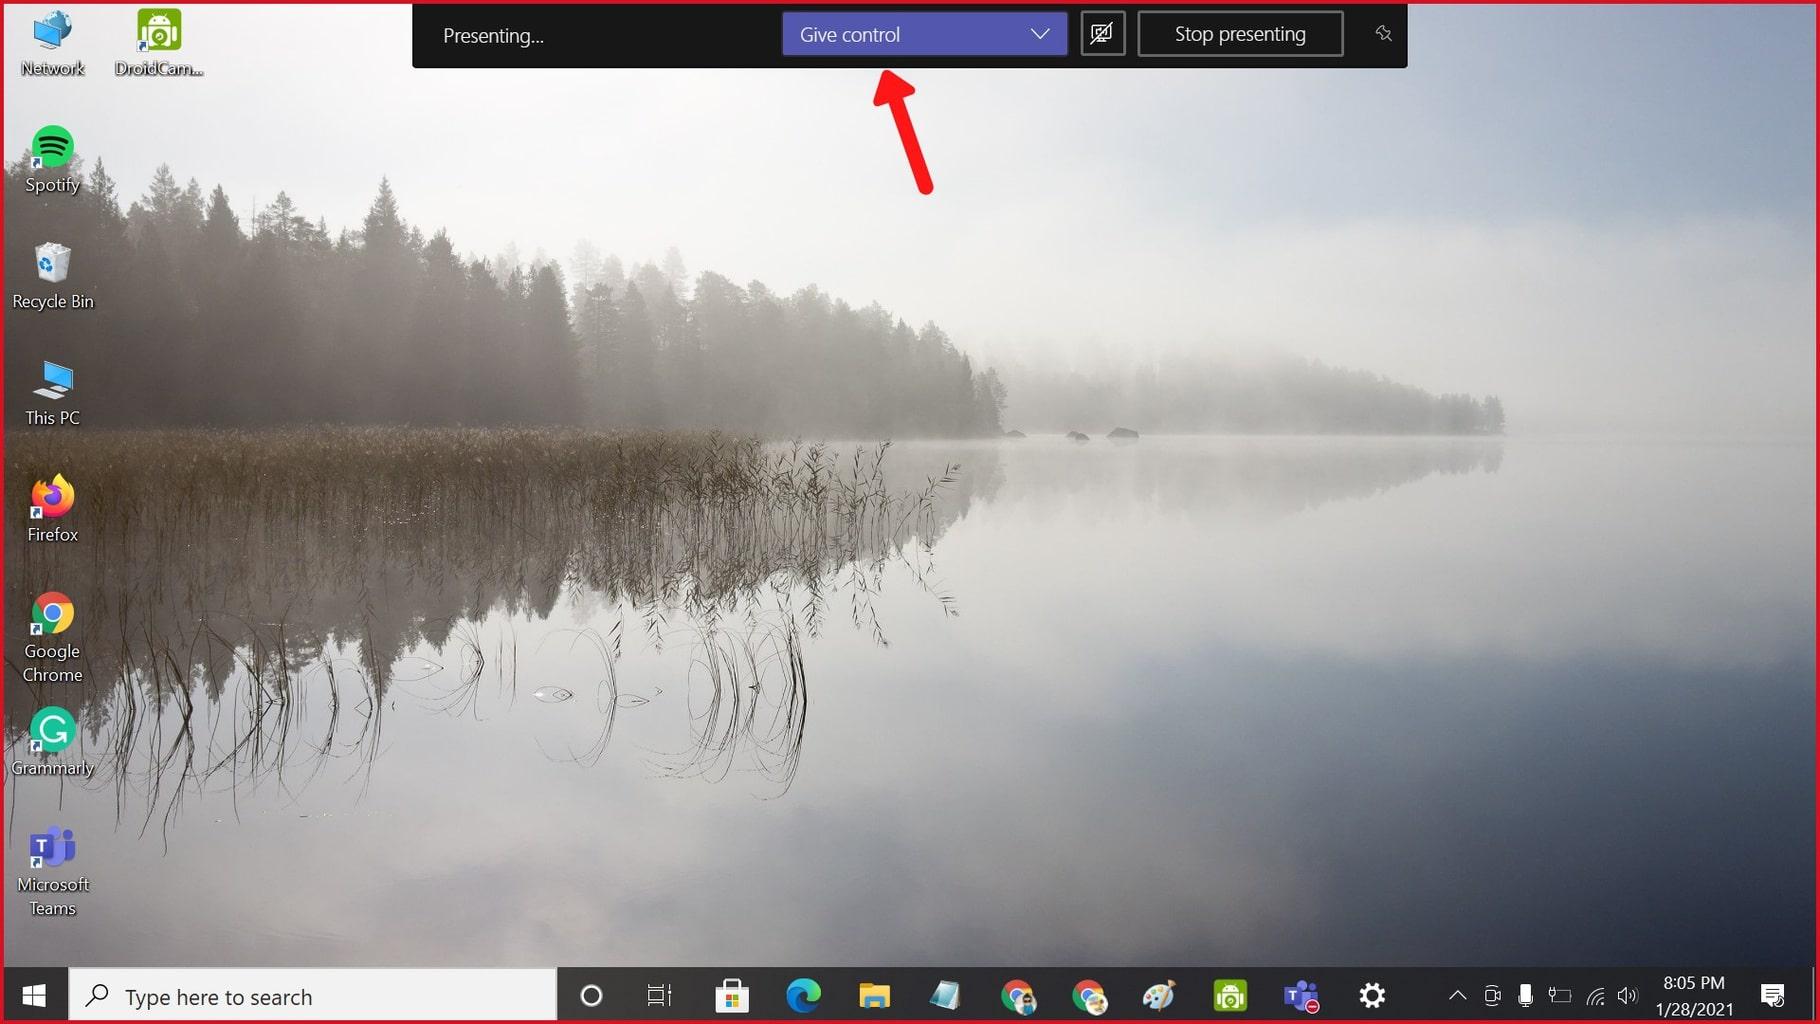 microsoft teams share screen give control